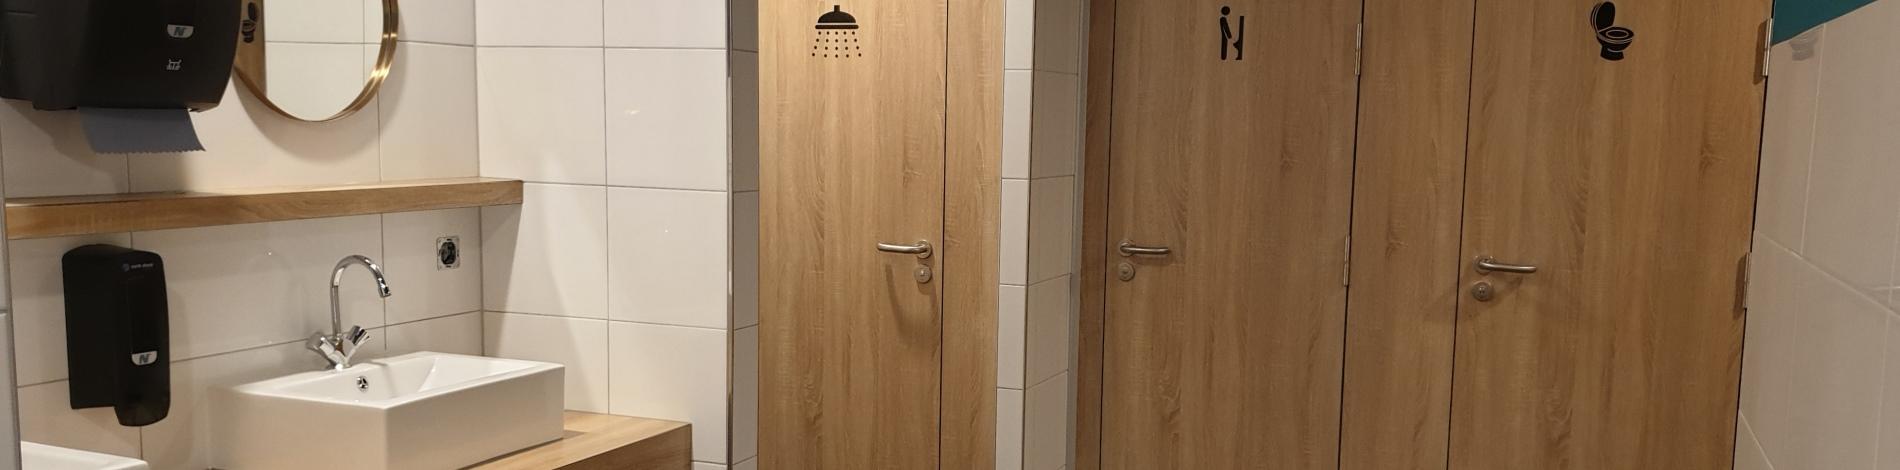 luxe sanitair zoals thuis